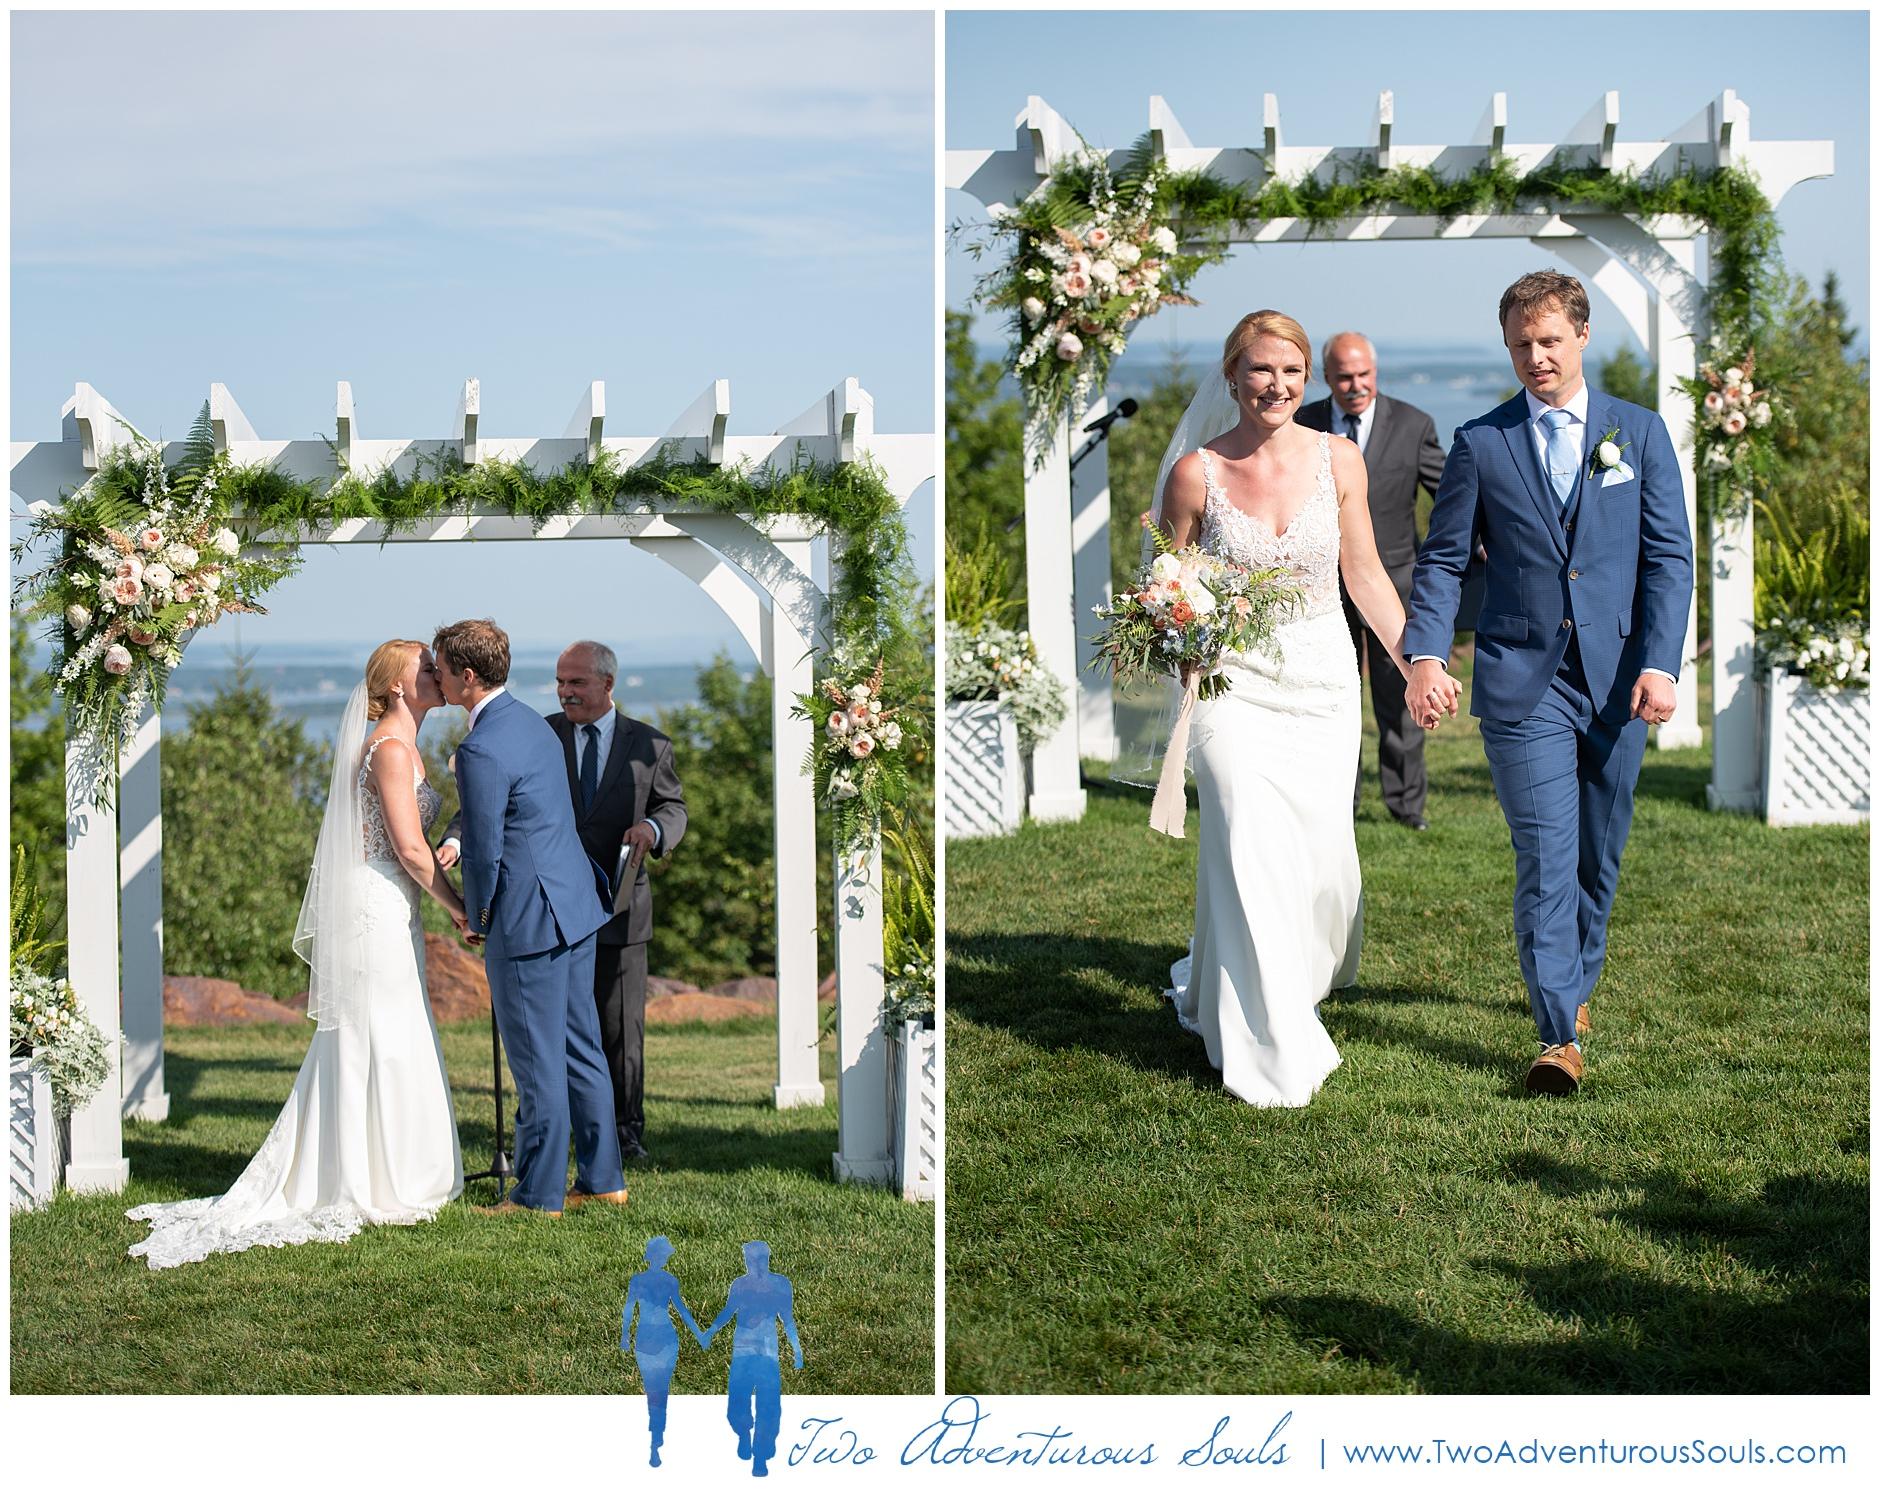 Maine Wedding Photographers, Point Lookout Wedding Photographers, Maine Elopement Photographers, Two Adventurous Souls-0080419_0043.jpg